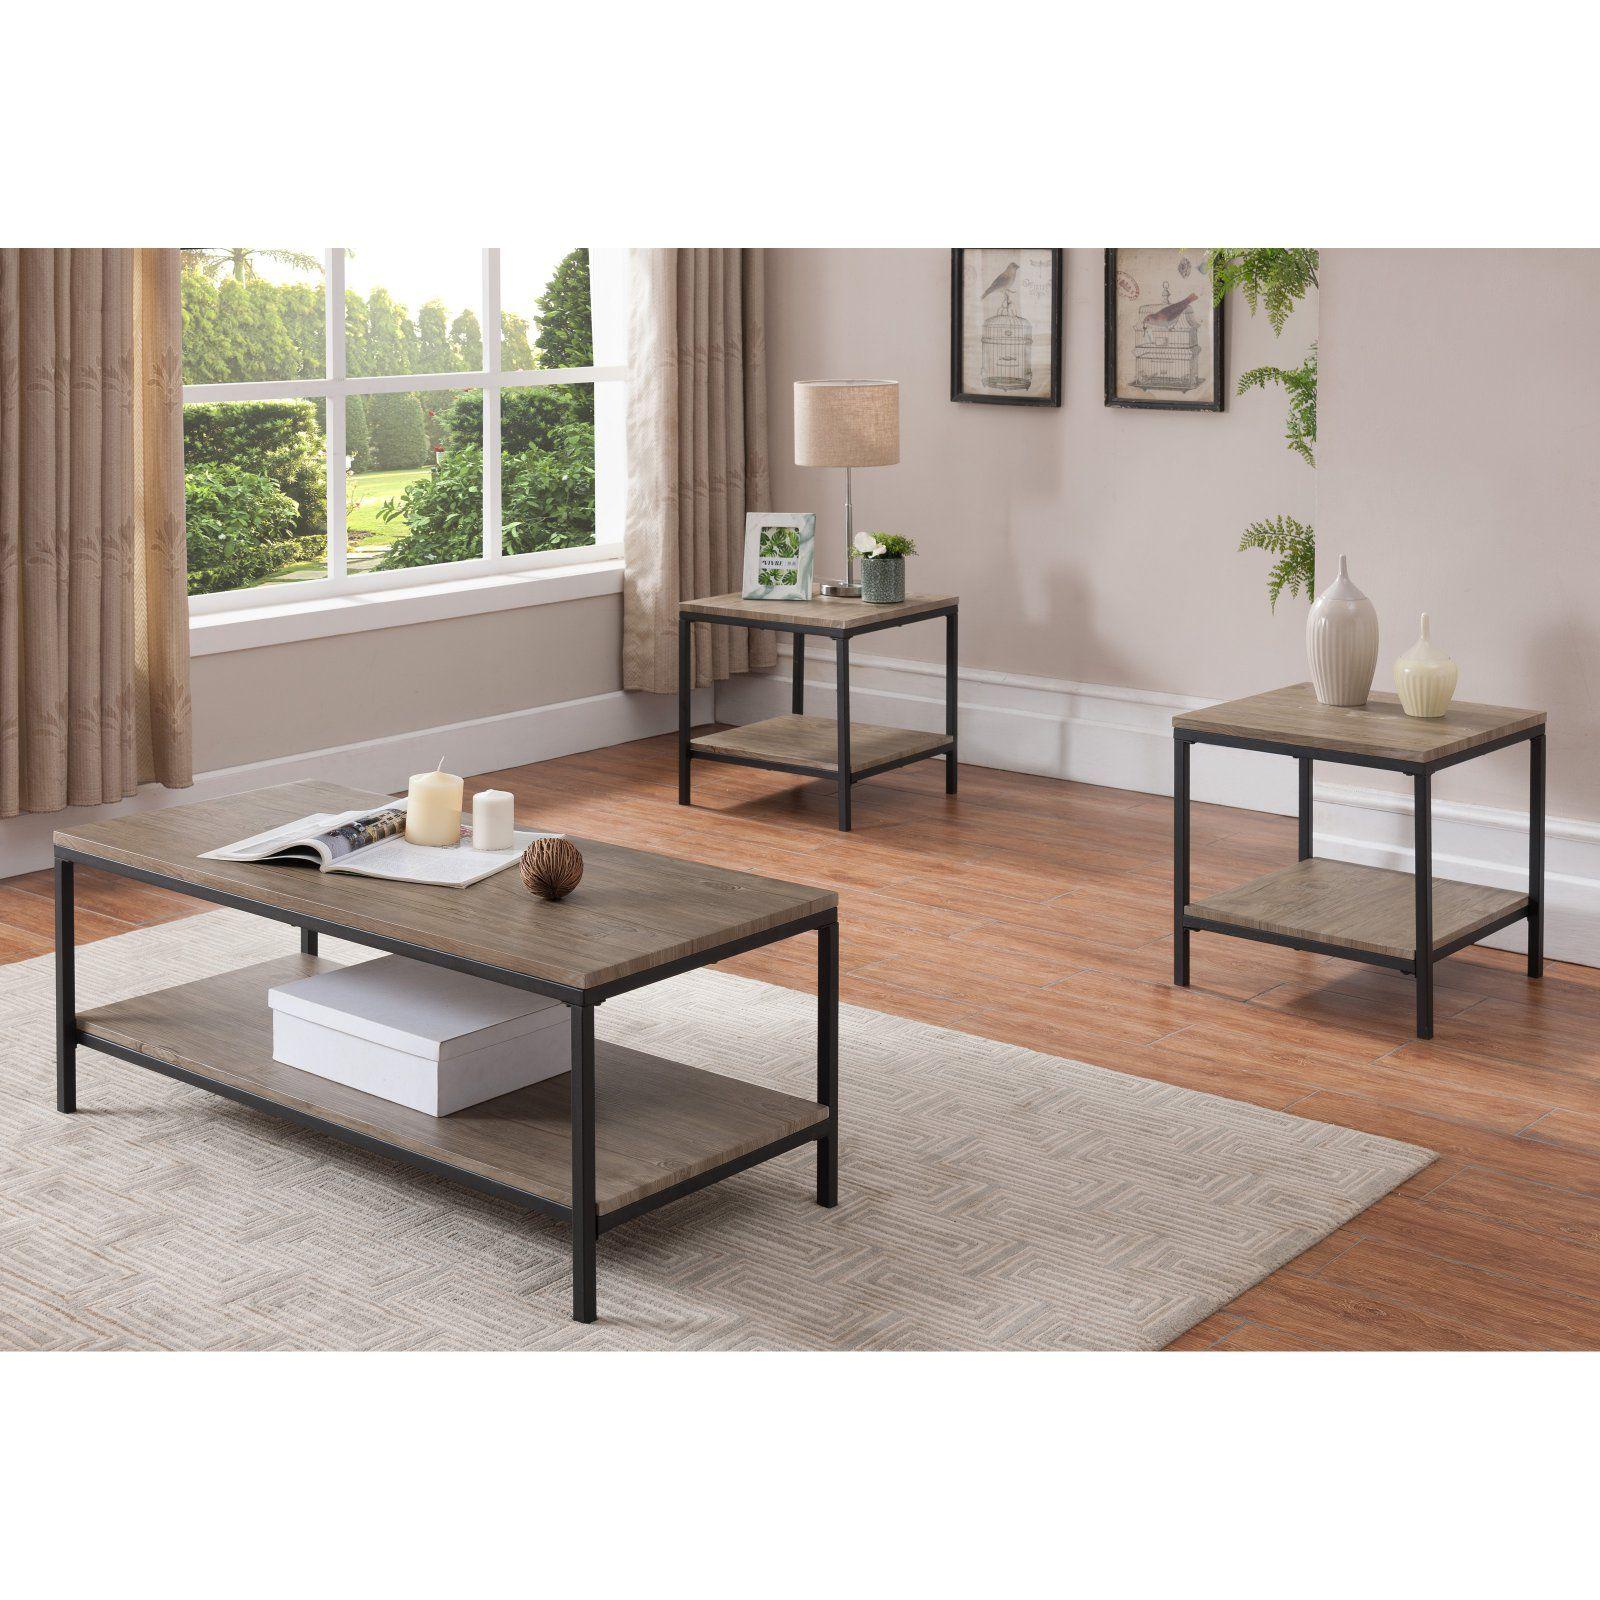 K B Furniture T1166 Wood Metal 3 Piece Coffee Table Set 3 Piece Coffee Table Set Coffee Table Coffee Table Setting [ 1600 x 1600 Pixel ]